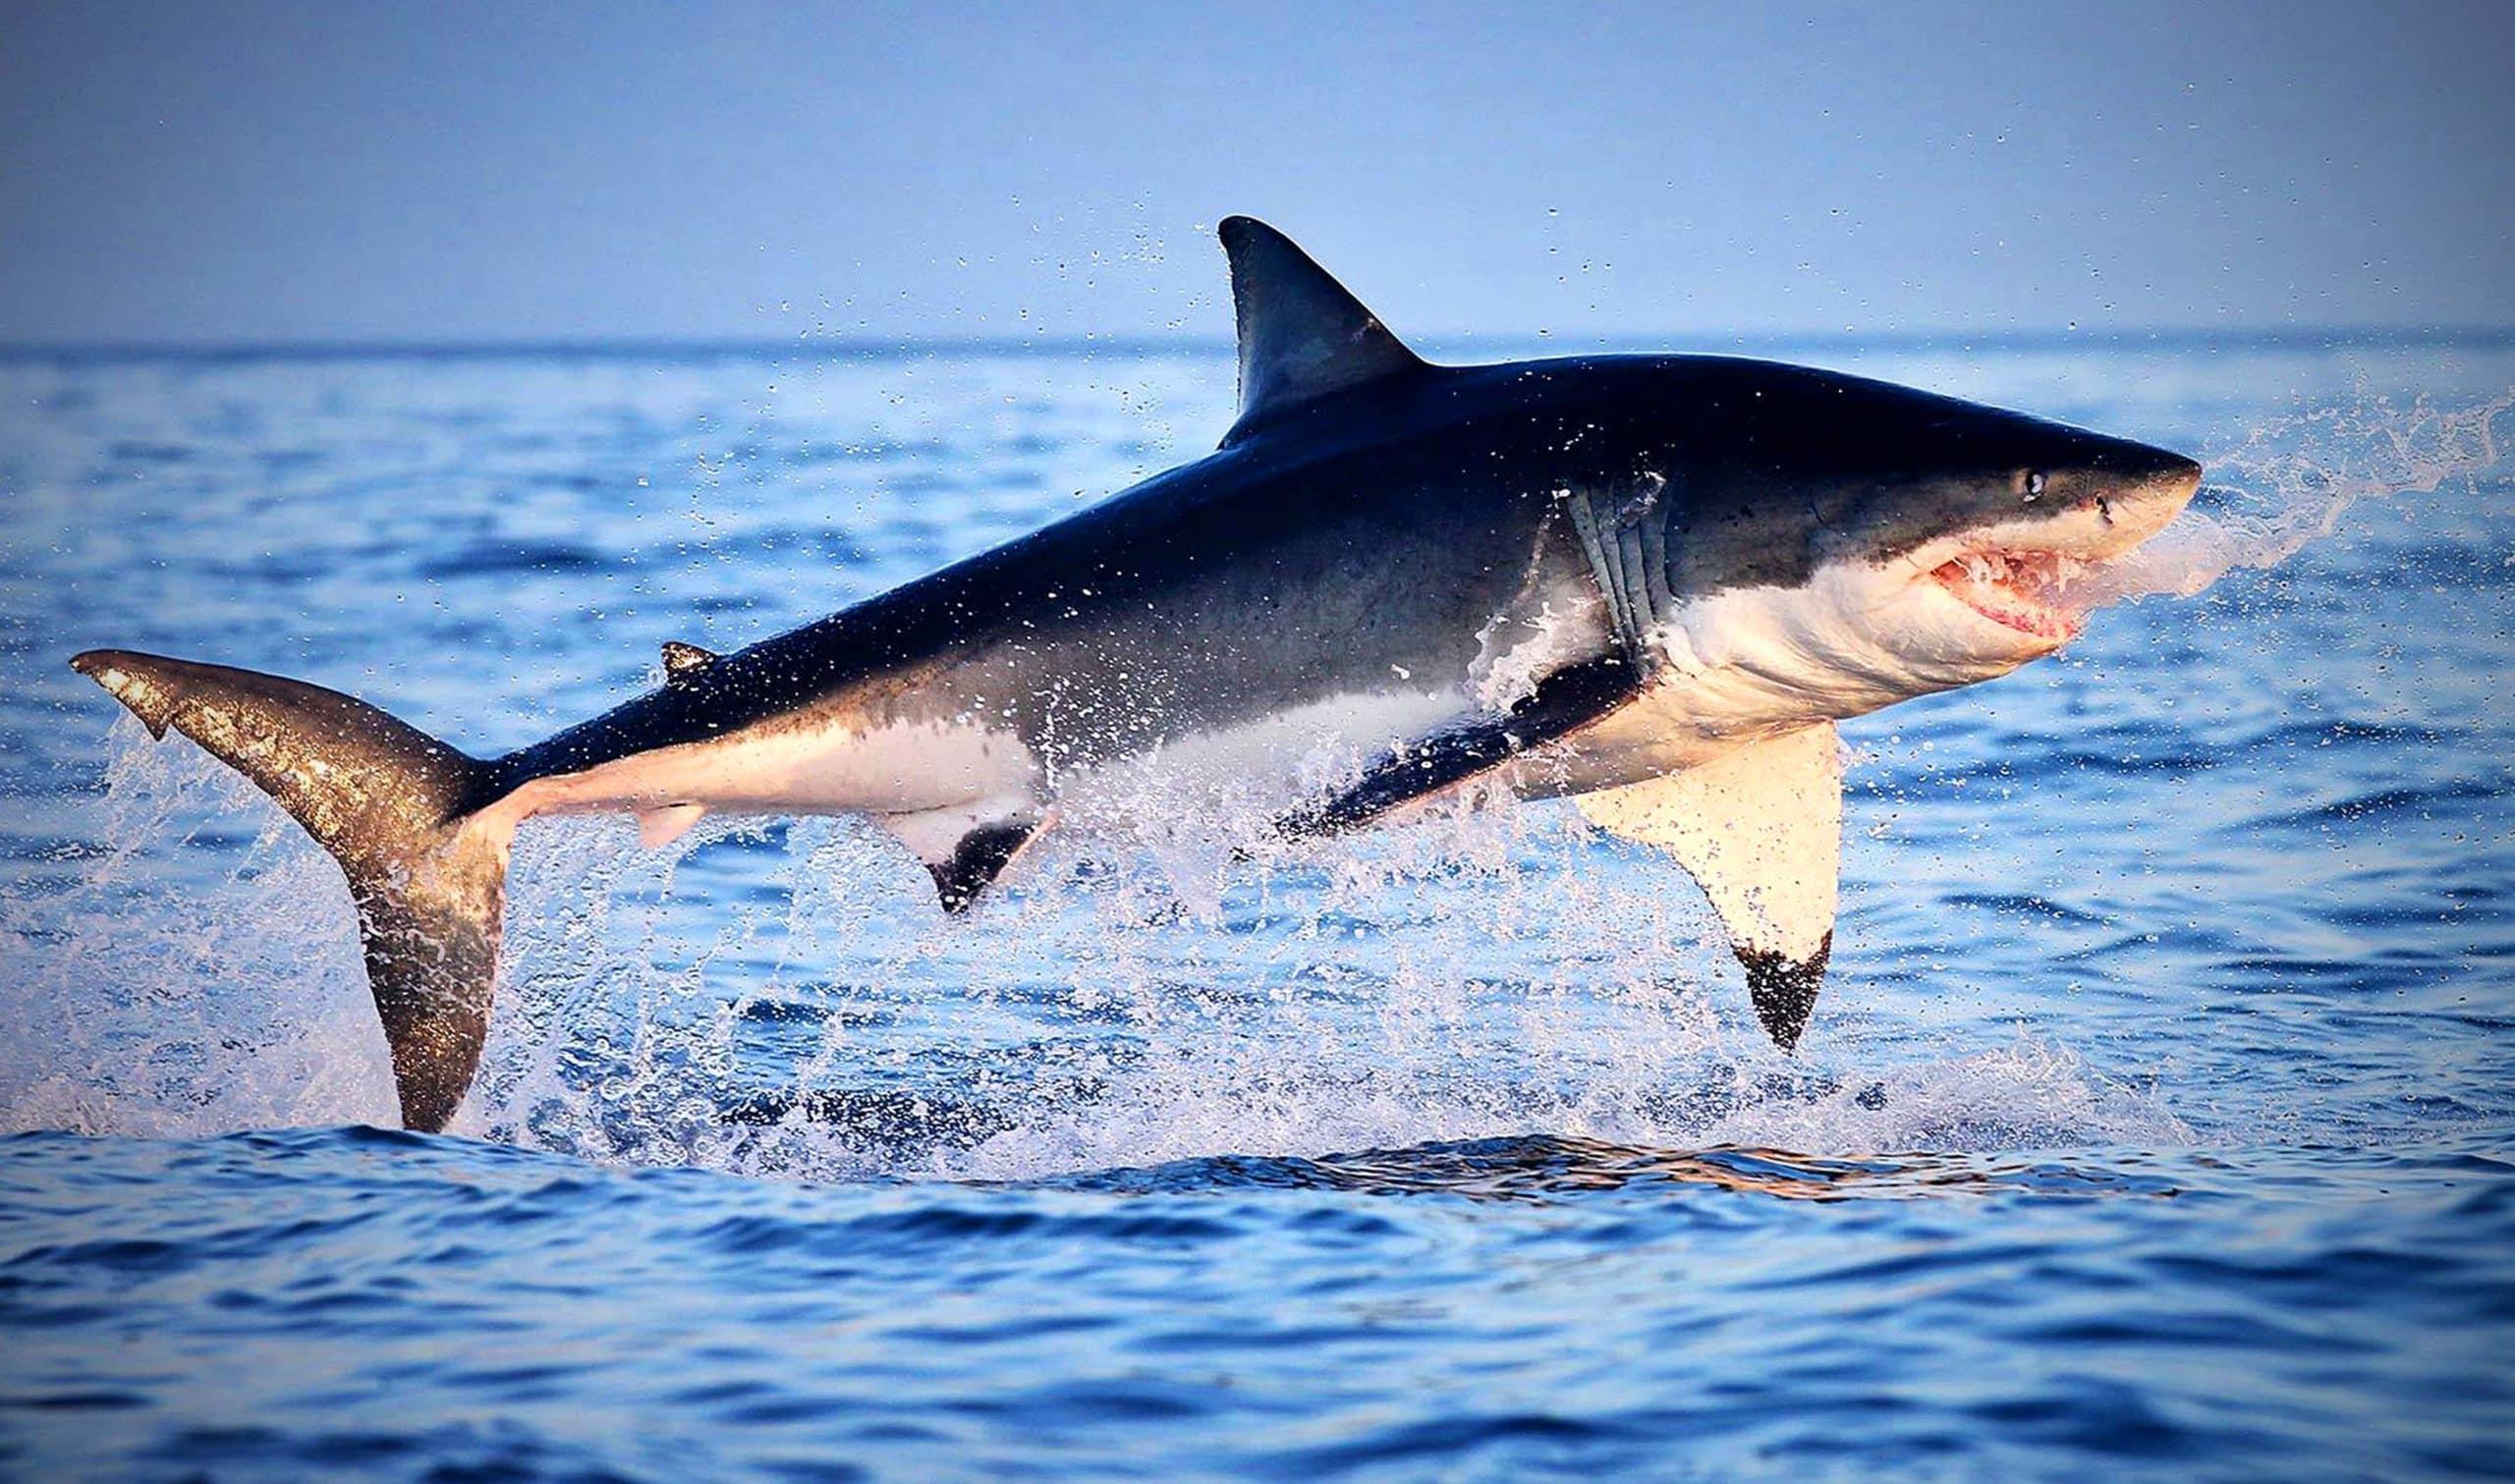 Акула выпрыгивает из воды